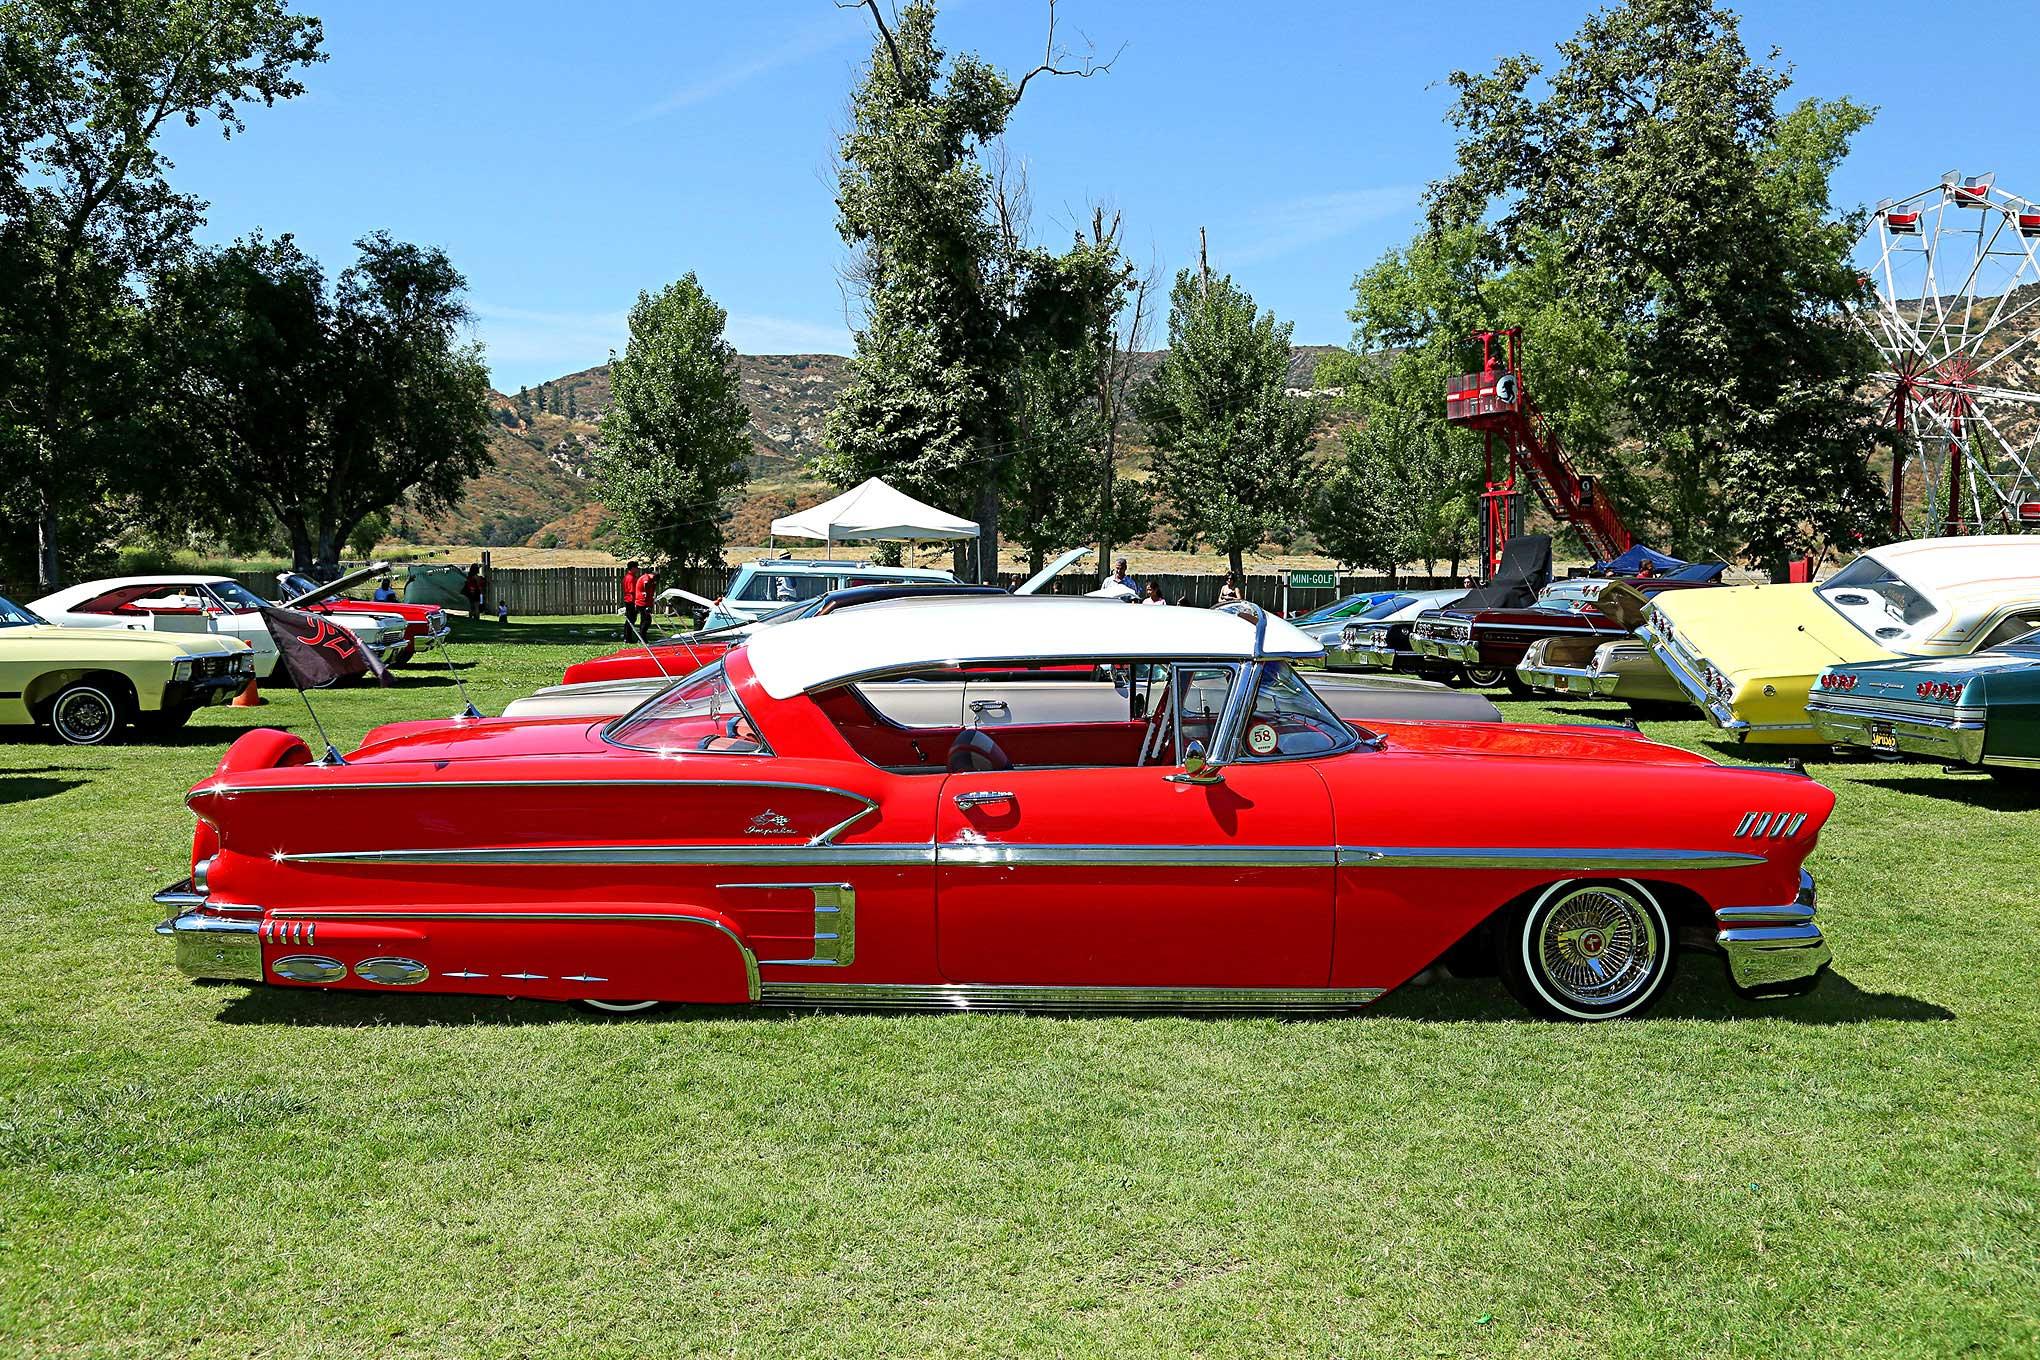 Impalas Car Club OC Chapter 2017 BBQ 1958 Impala - Lowrider